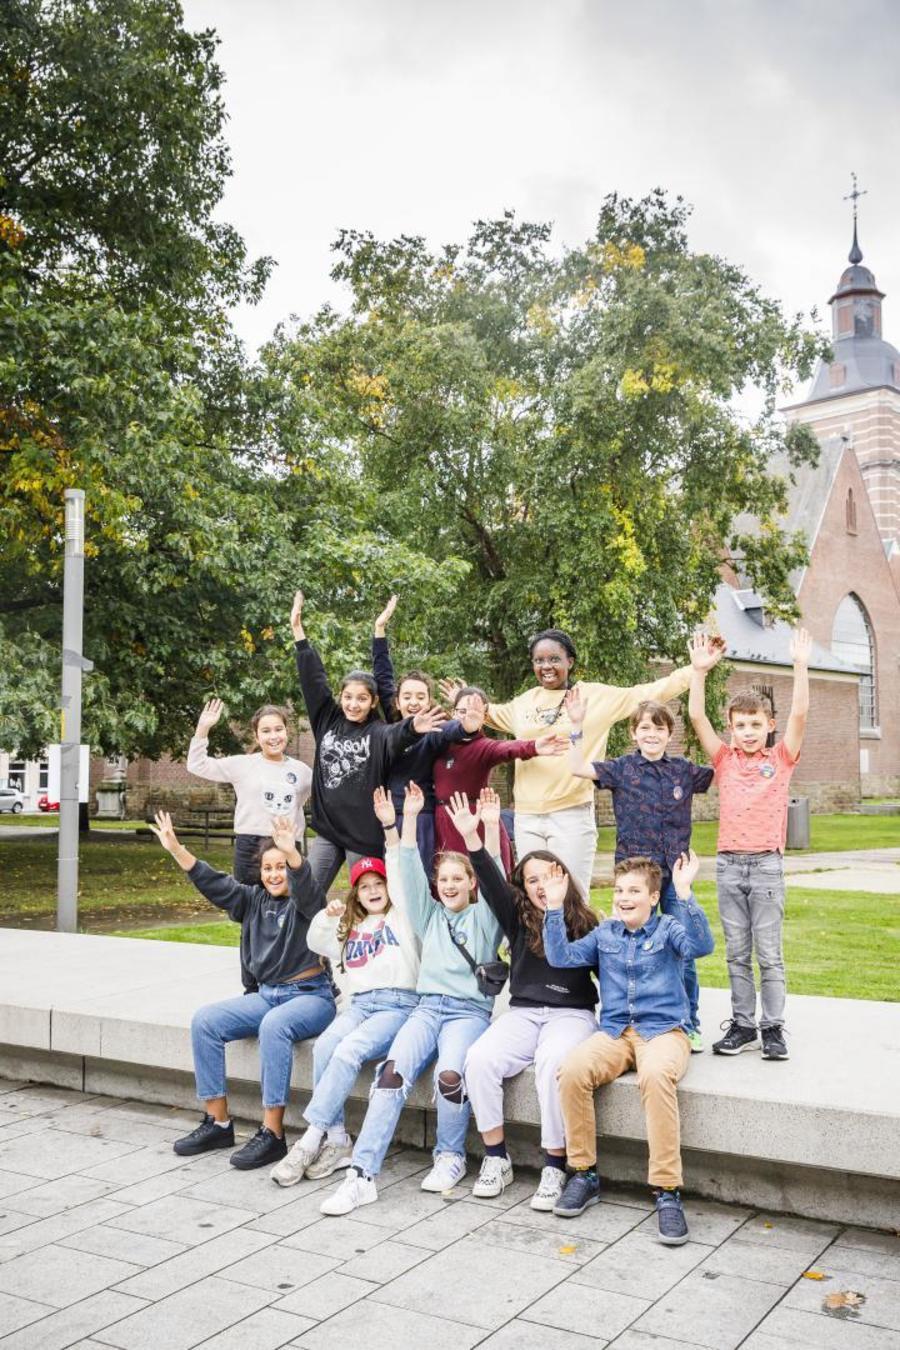 Groepsfoto op het Burgemeester Nolfplein